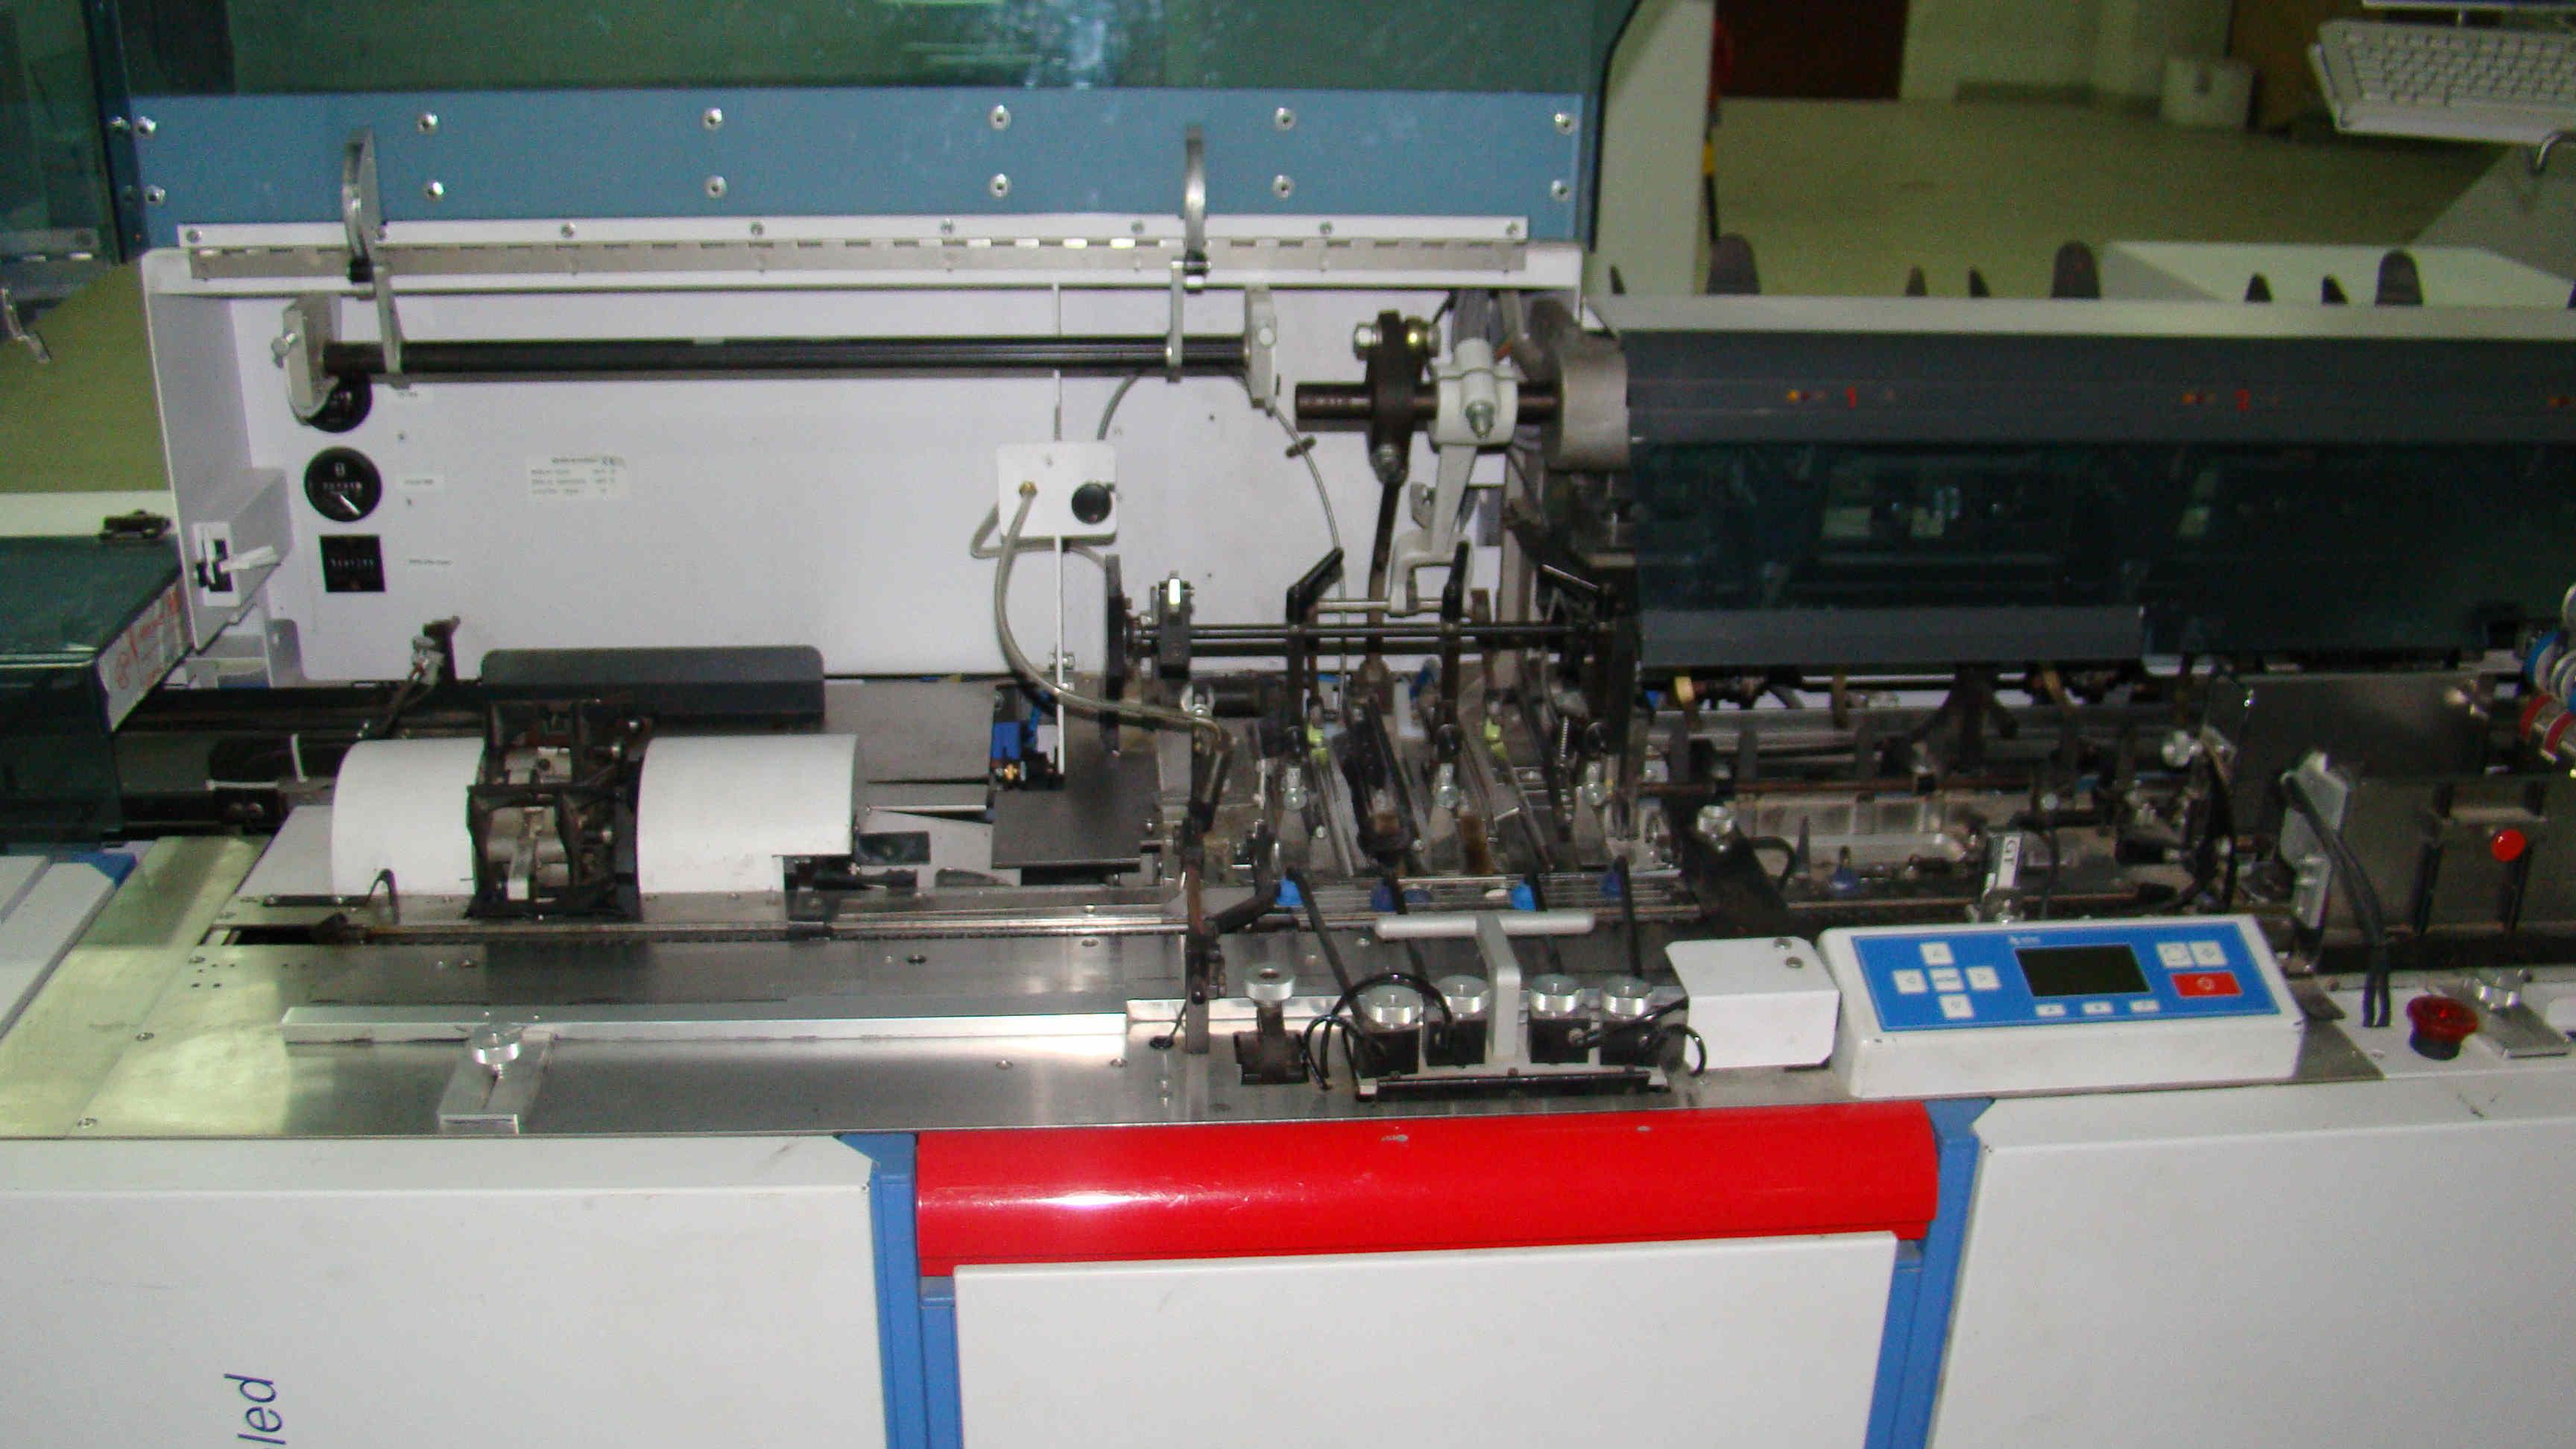 Used Bowe Enduro Mail Inserting Machine With Enclosure